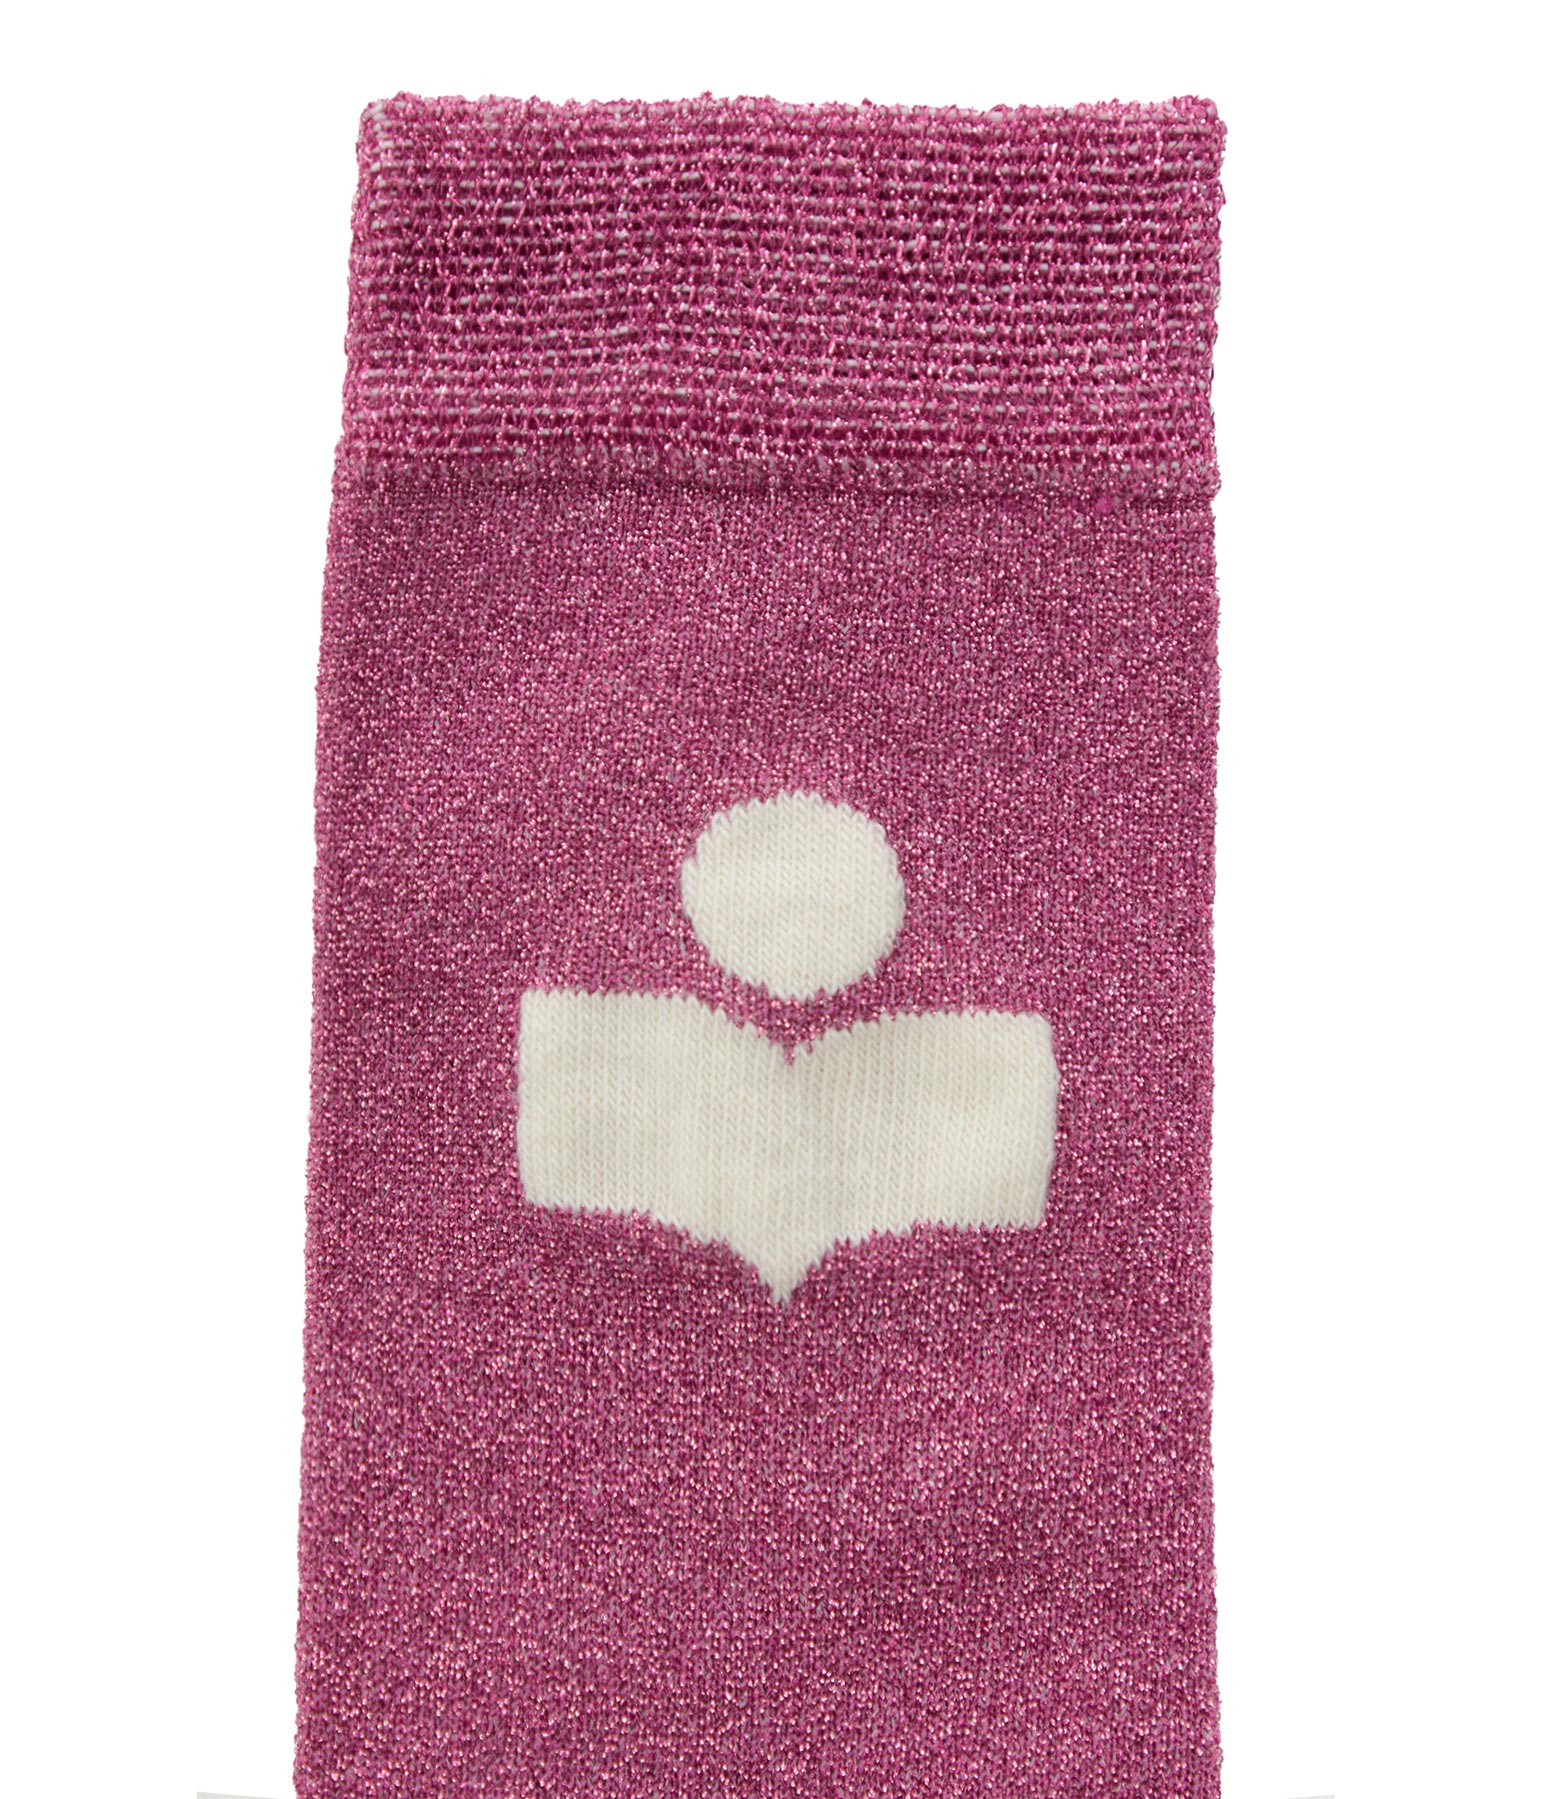 ISABEL MARANT - Chaussettes Slazia Rose Bonbon